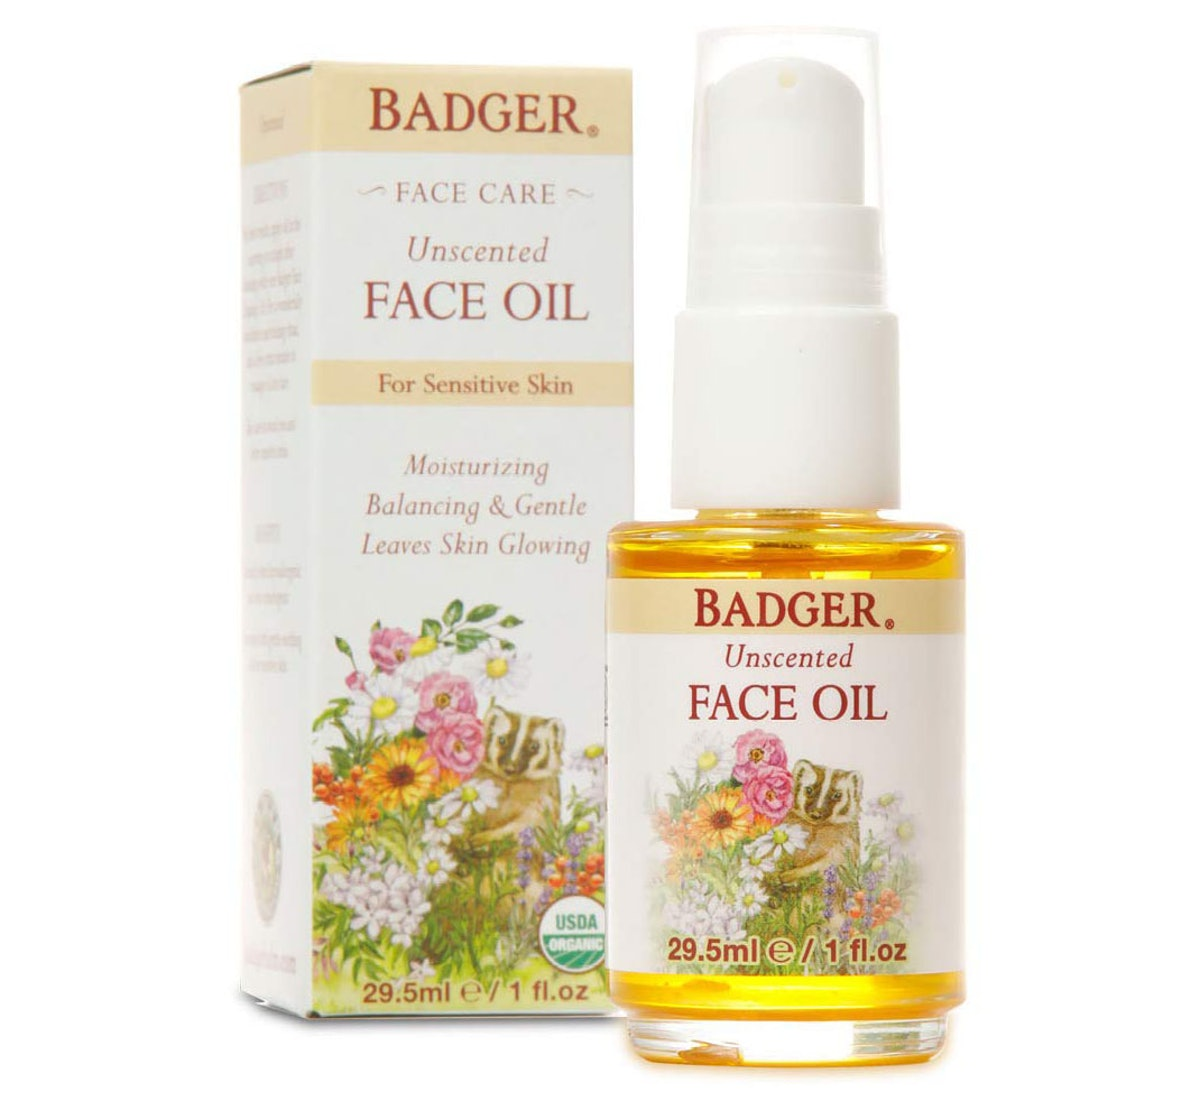 Badger Unscented Face Oil